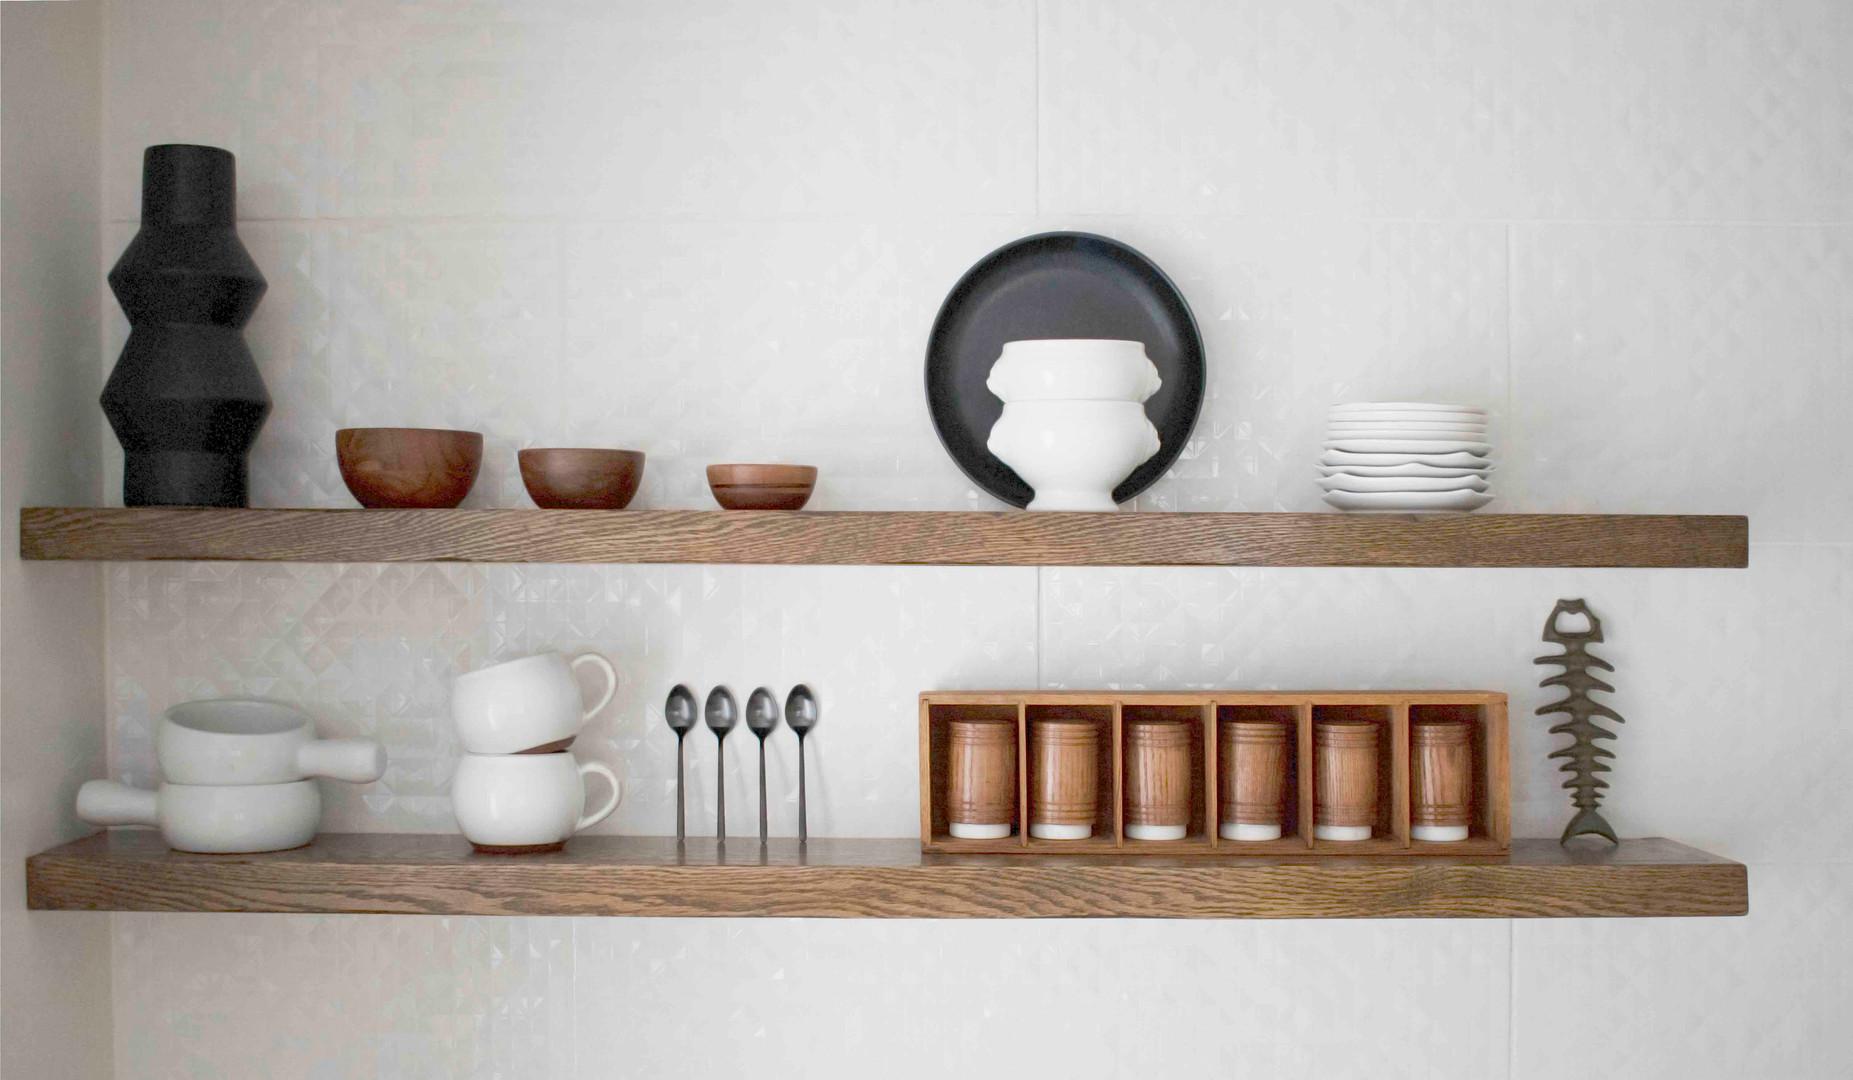 shelfdetail_kitchen.jpg